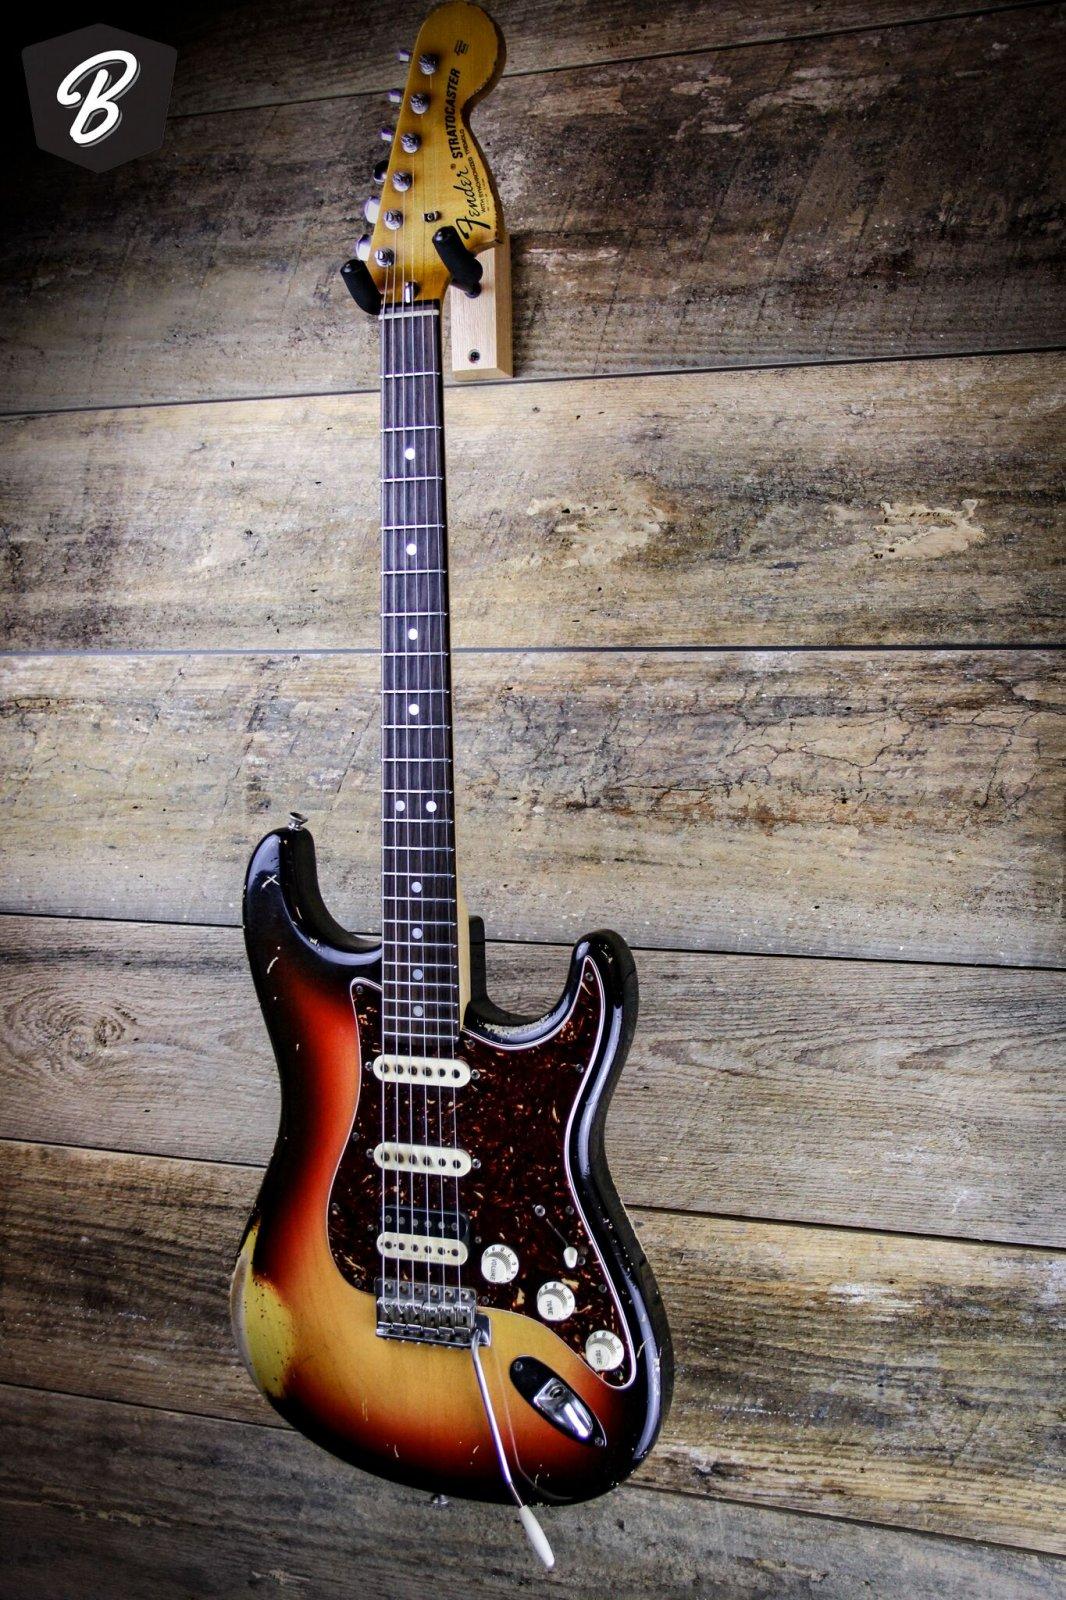 Fender Custom Shop Stratocaster '69 Relic John Cruz Master Build- 2012 Model